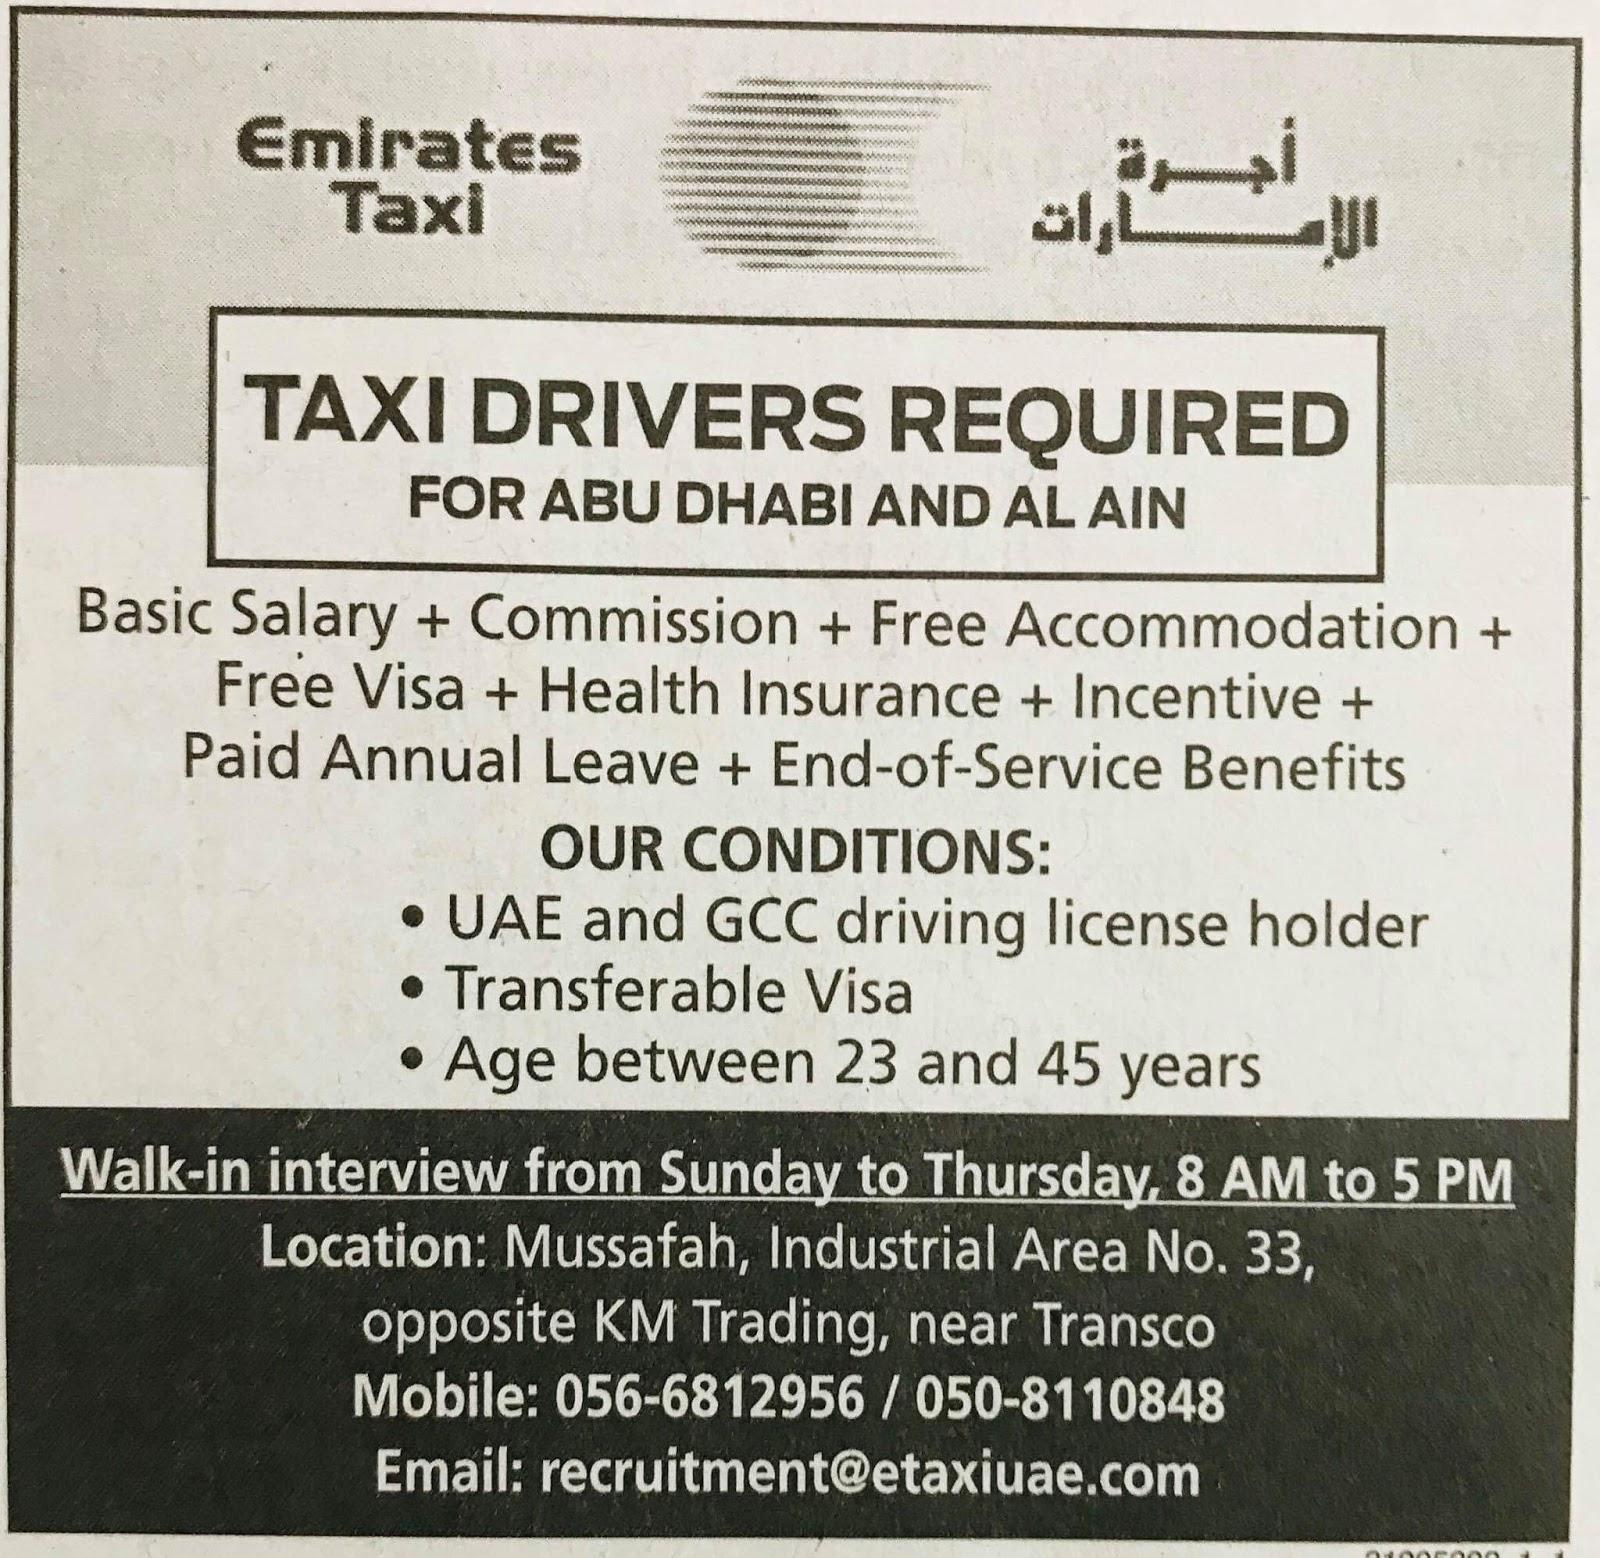 Required Taxi Drivers for UAE Local Hiring JOBS Khaleej